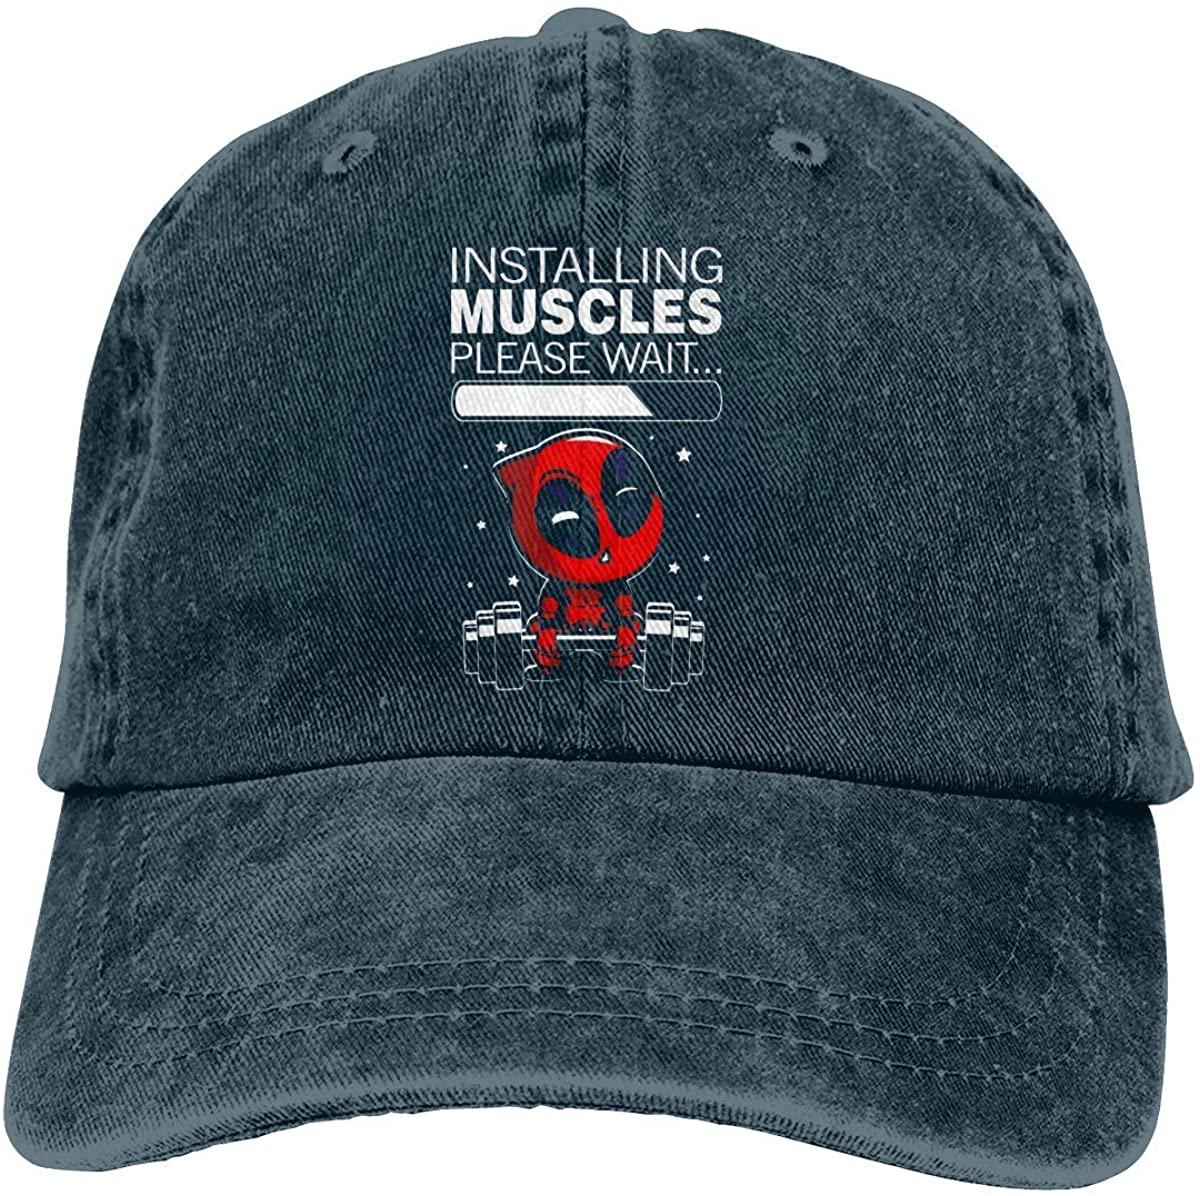 Vintage Adjustable Jean Cap Gym Caps for Adult